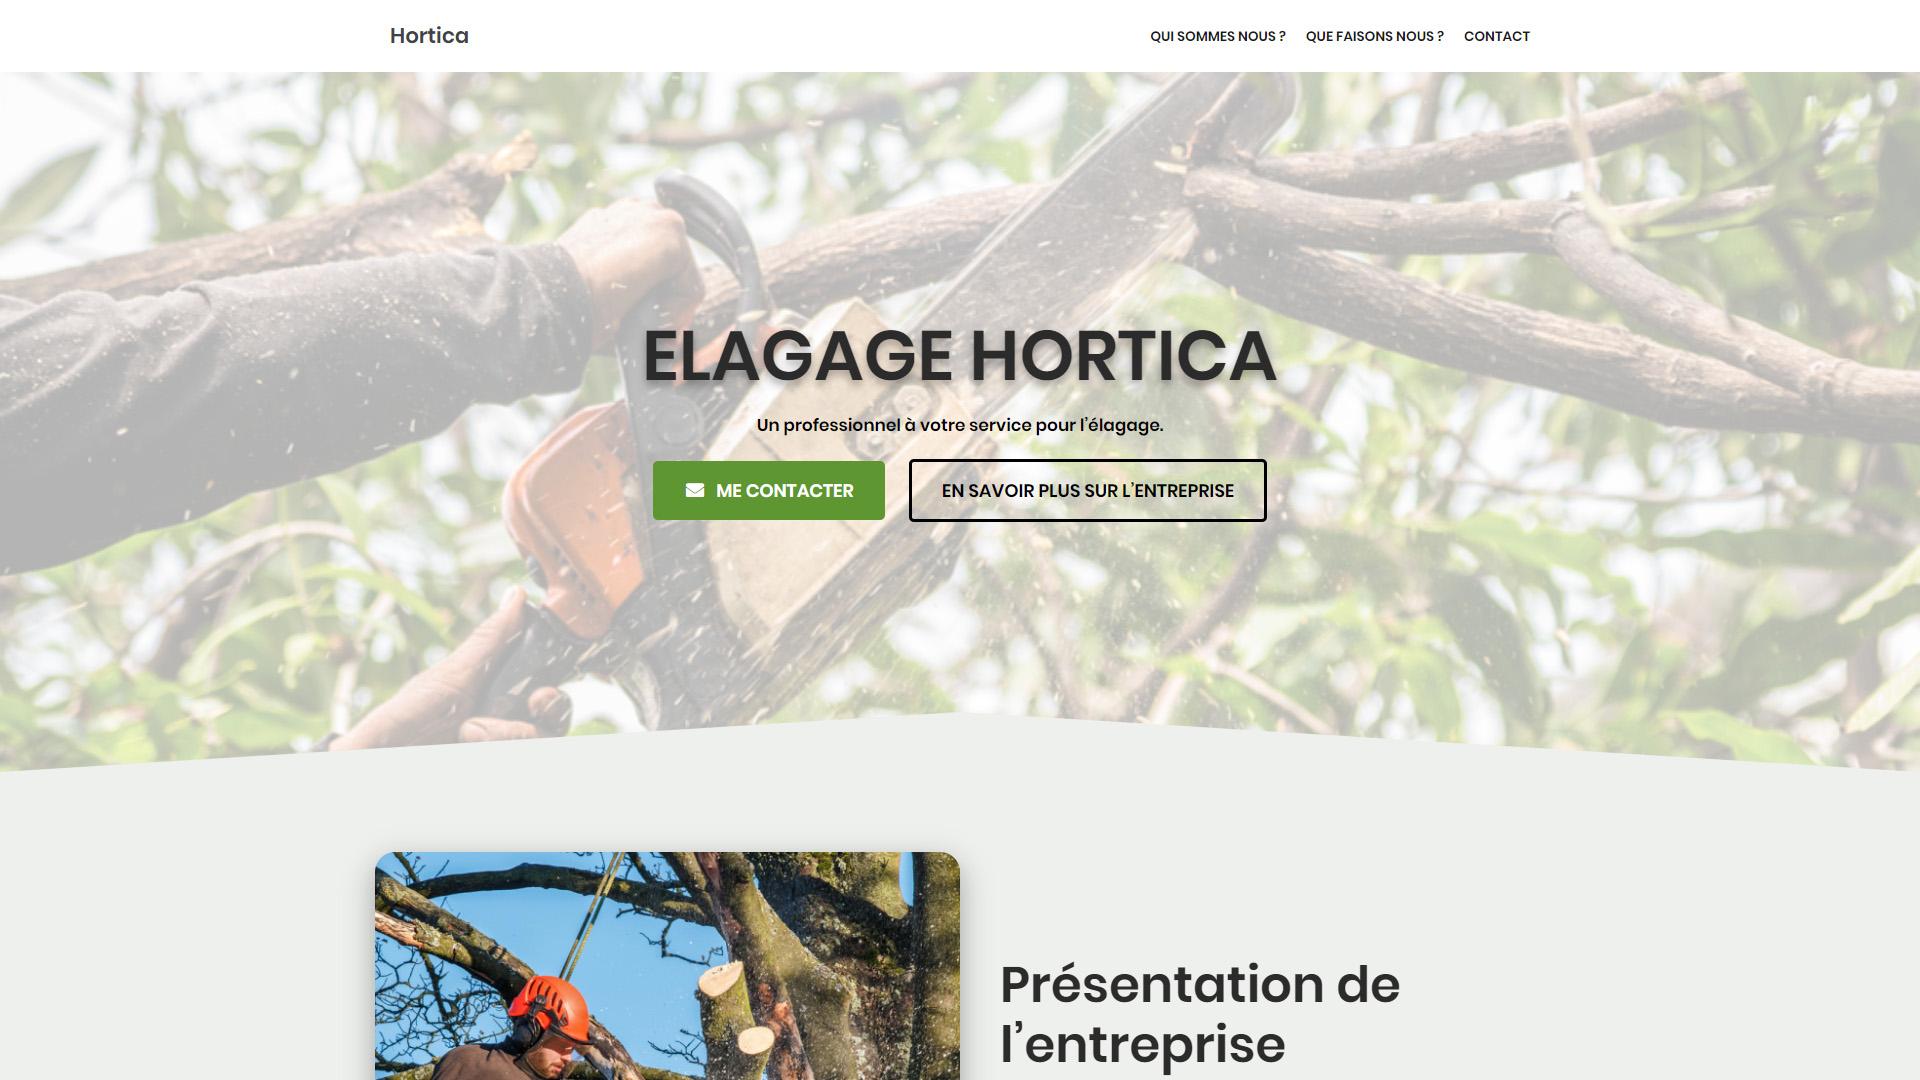 Elagage Hortica